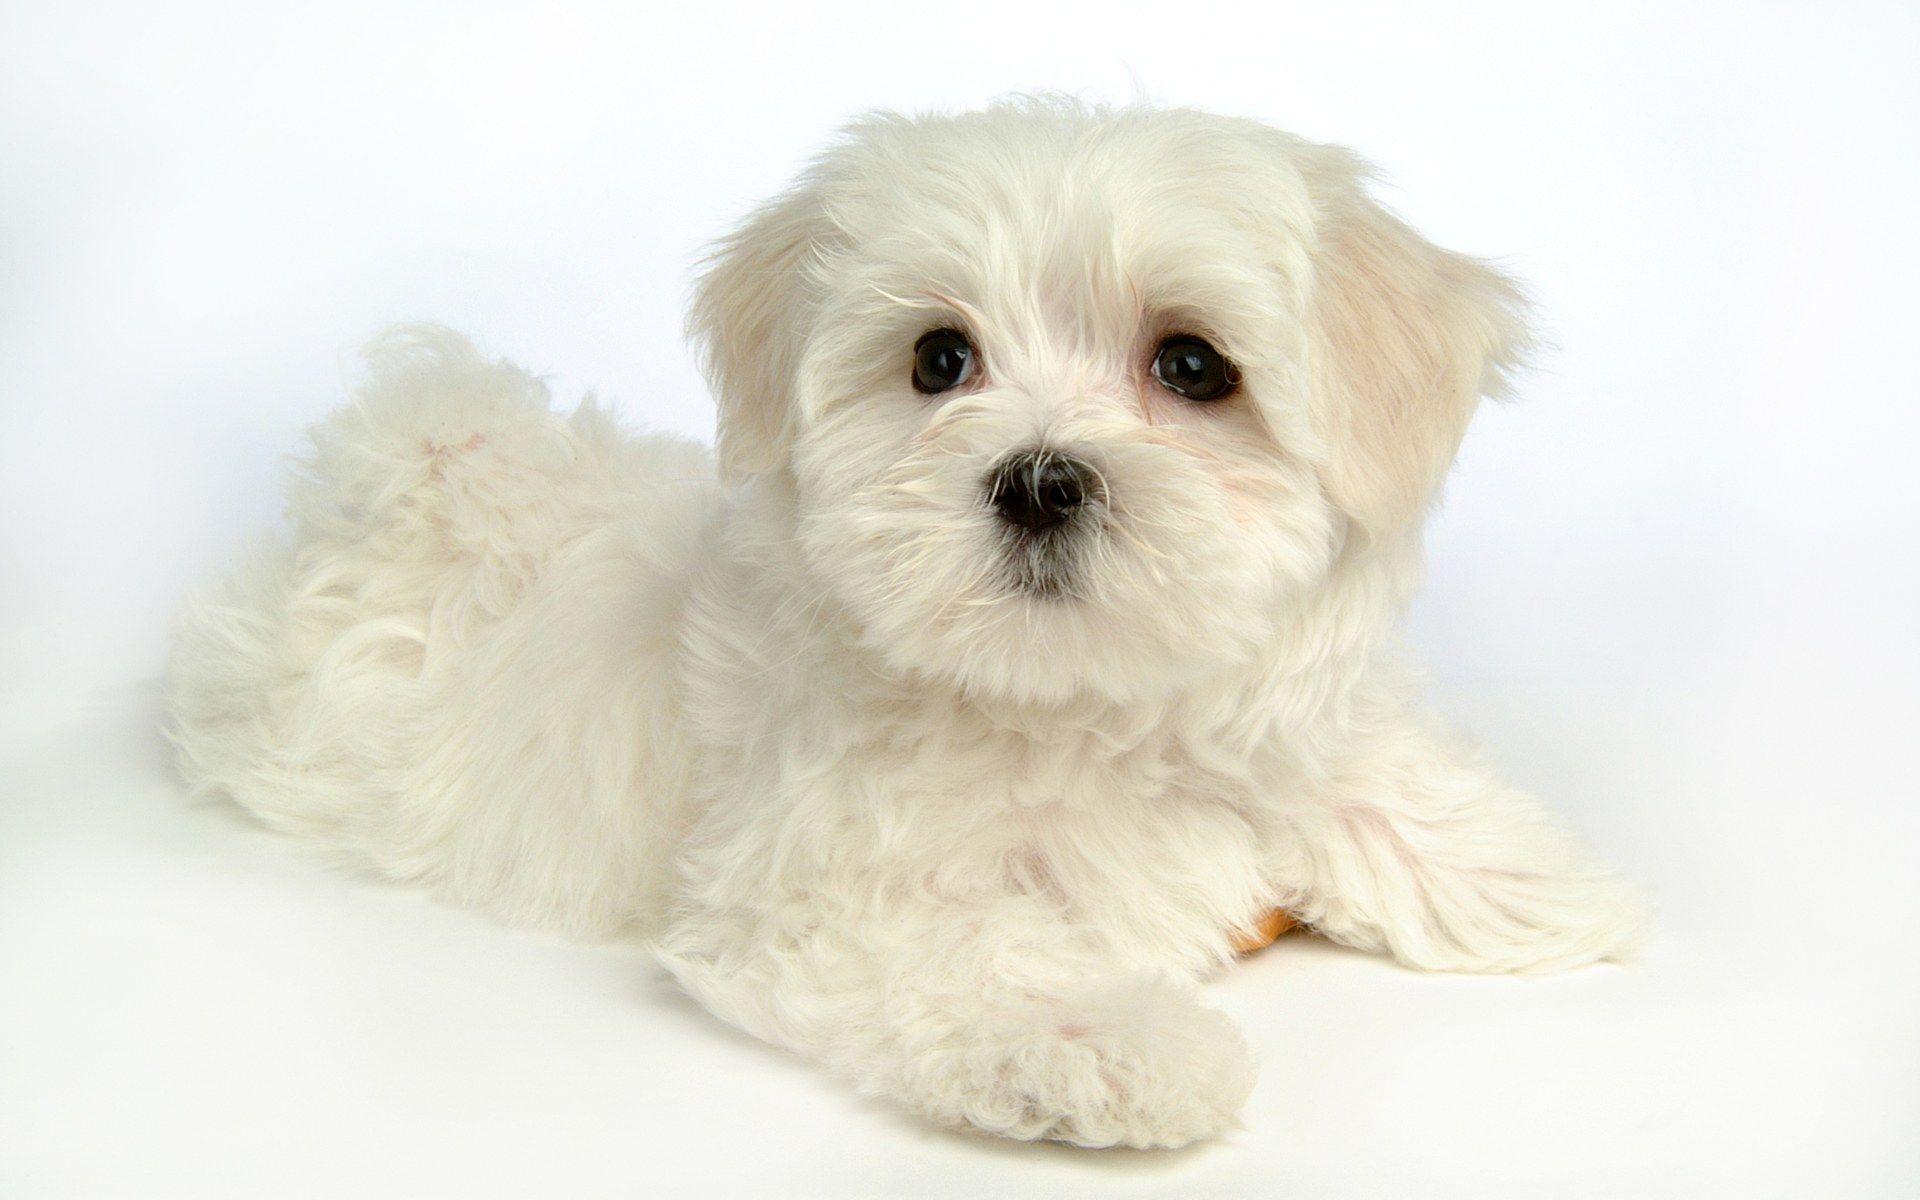 Maltese Dog Fluffy Maltese Puppy Dogs White Maltese Puppies